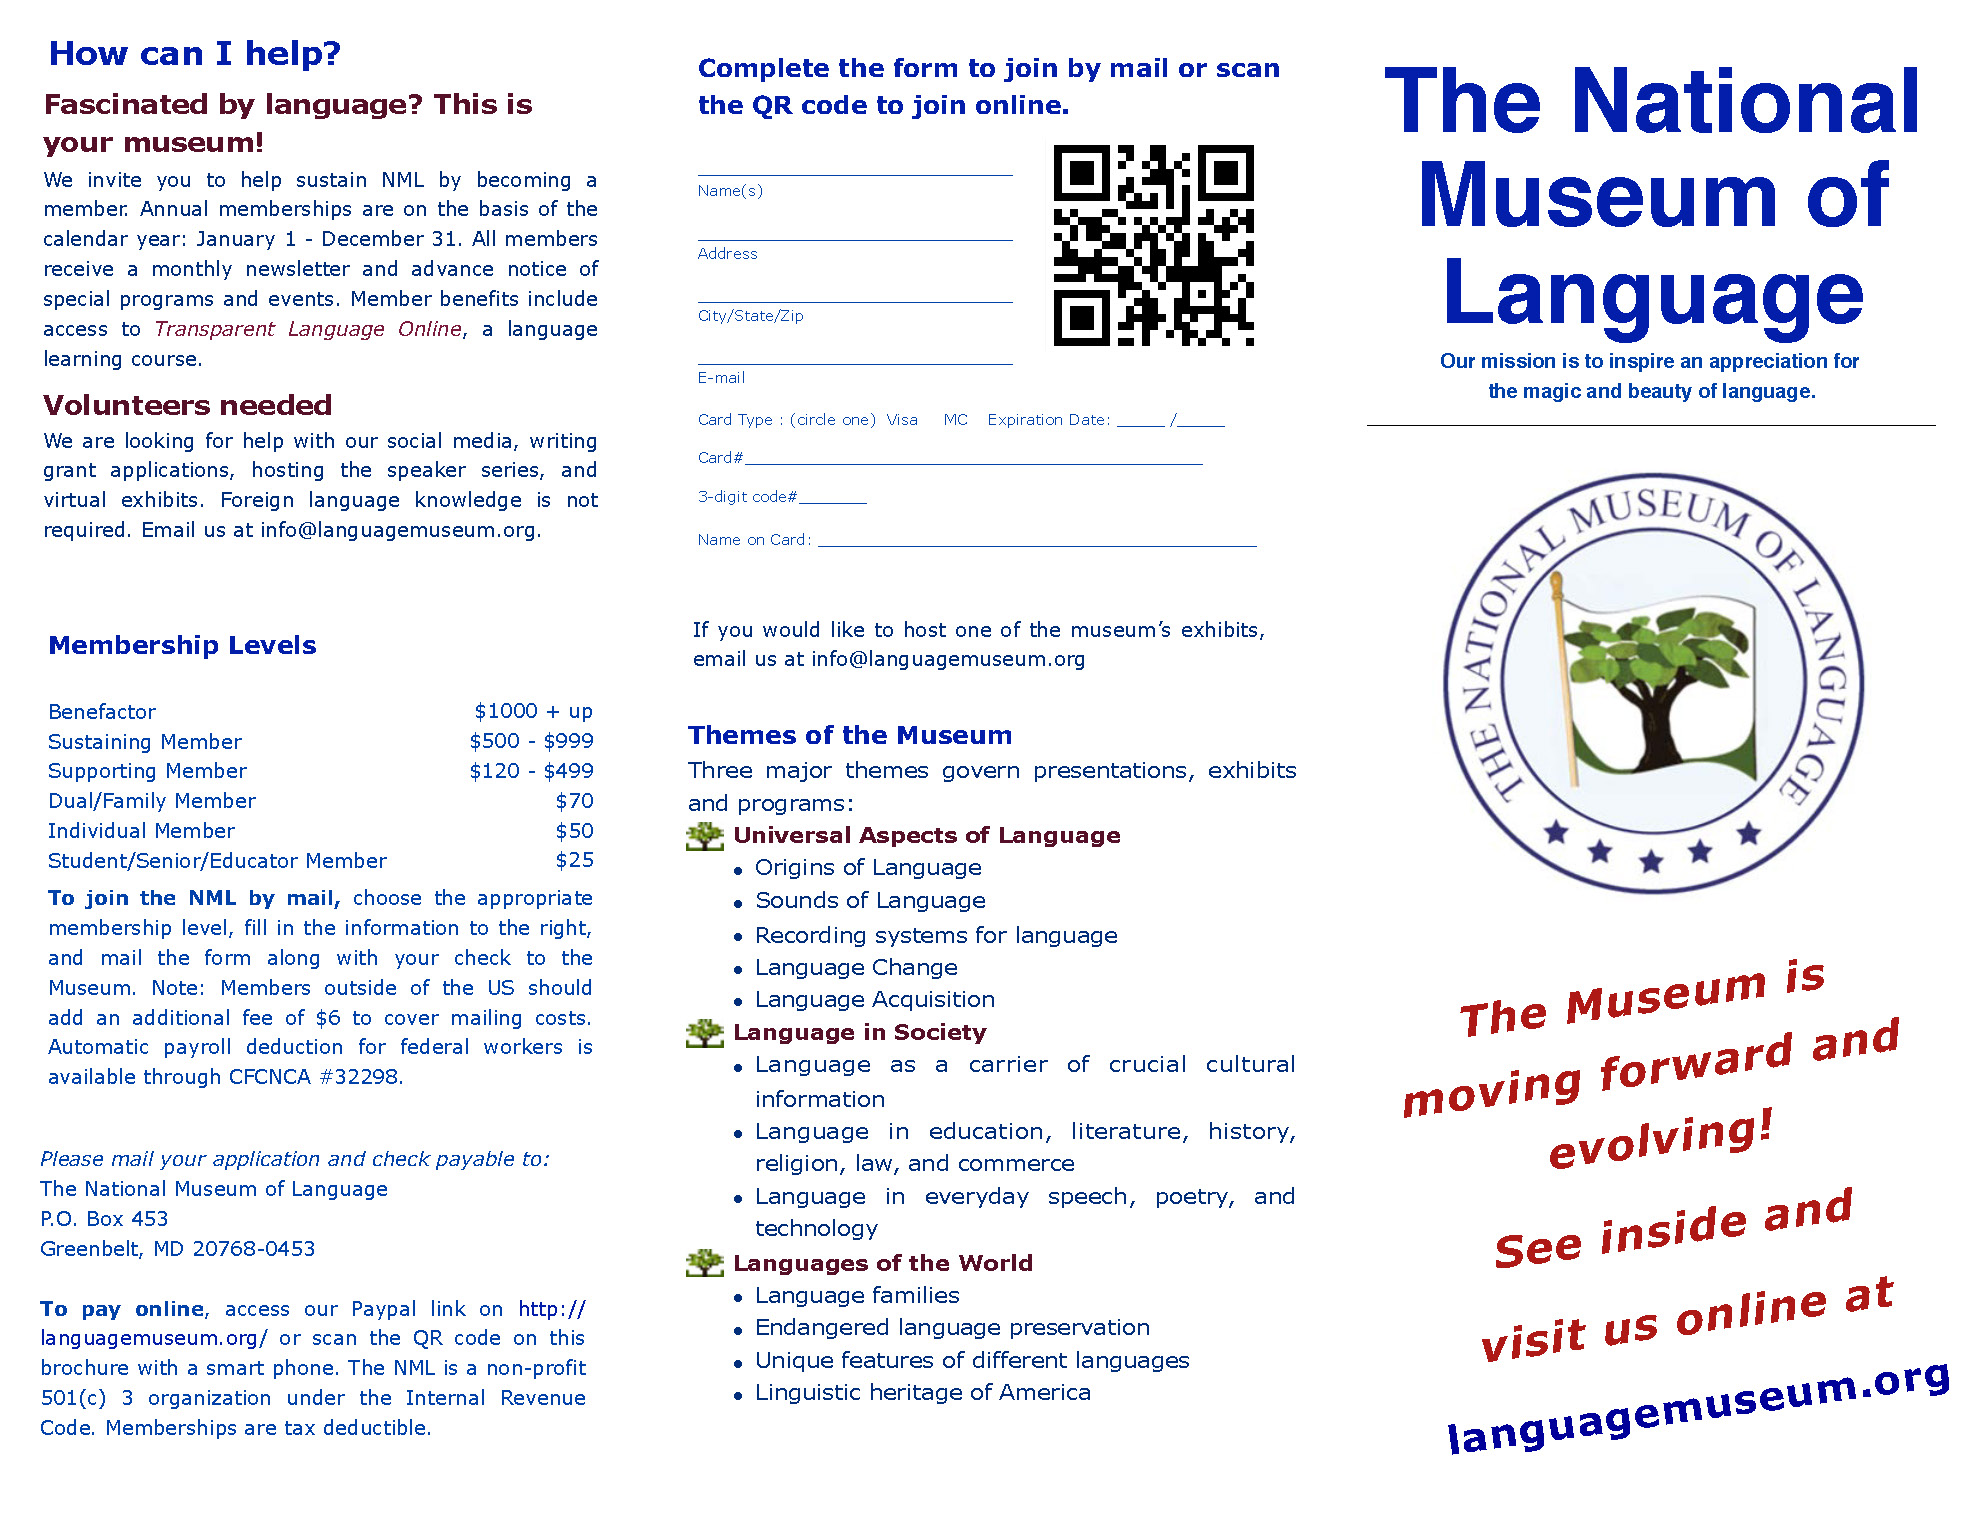 NML Brochure 2016_Page_1